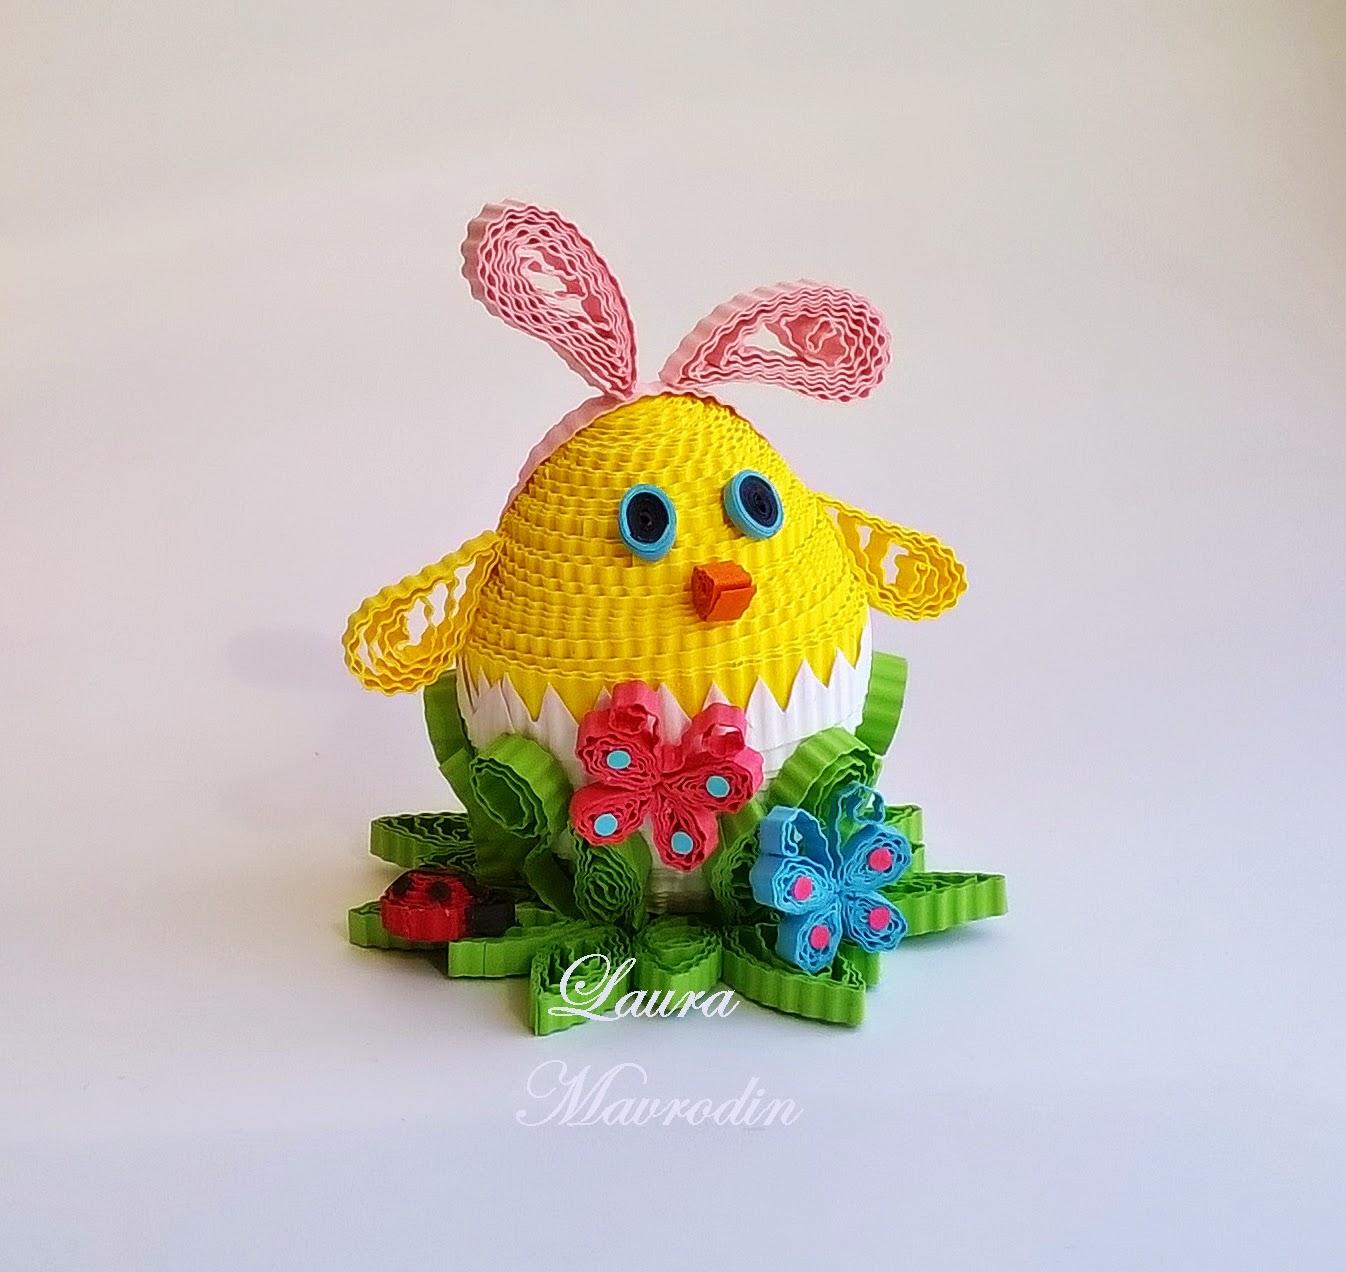 Quilling my passion decoratiuni pt paste easter decorations for Easter decorations for the home pinterest